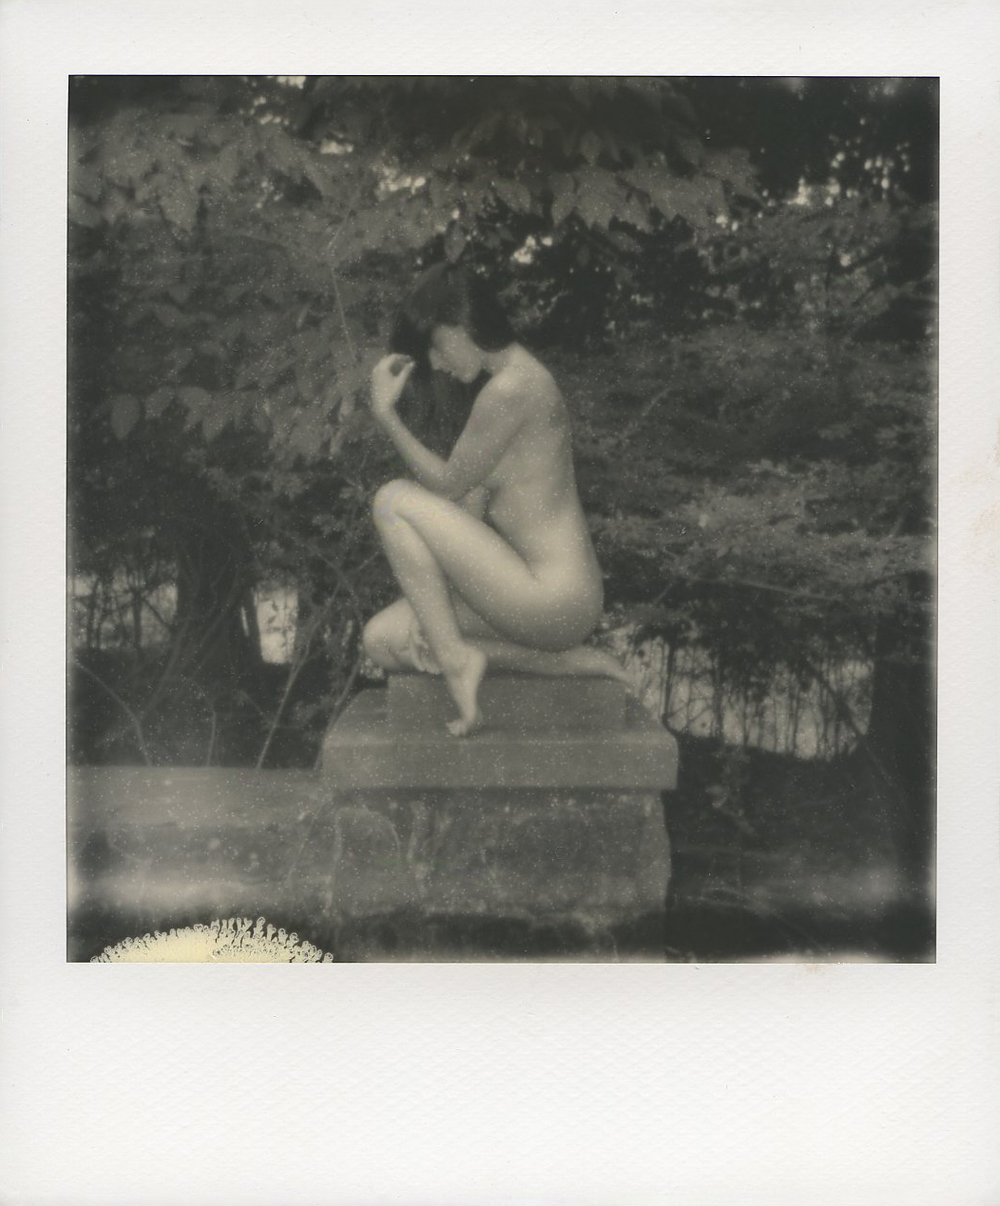 p_006.jpg